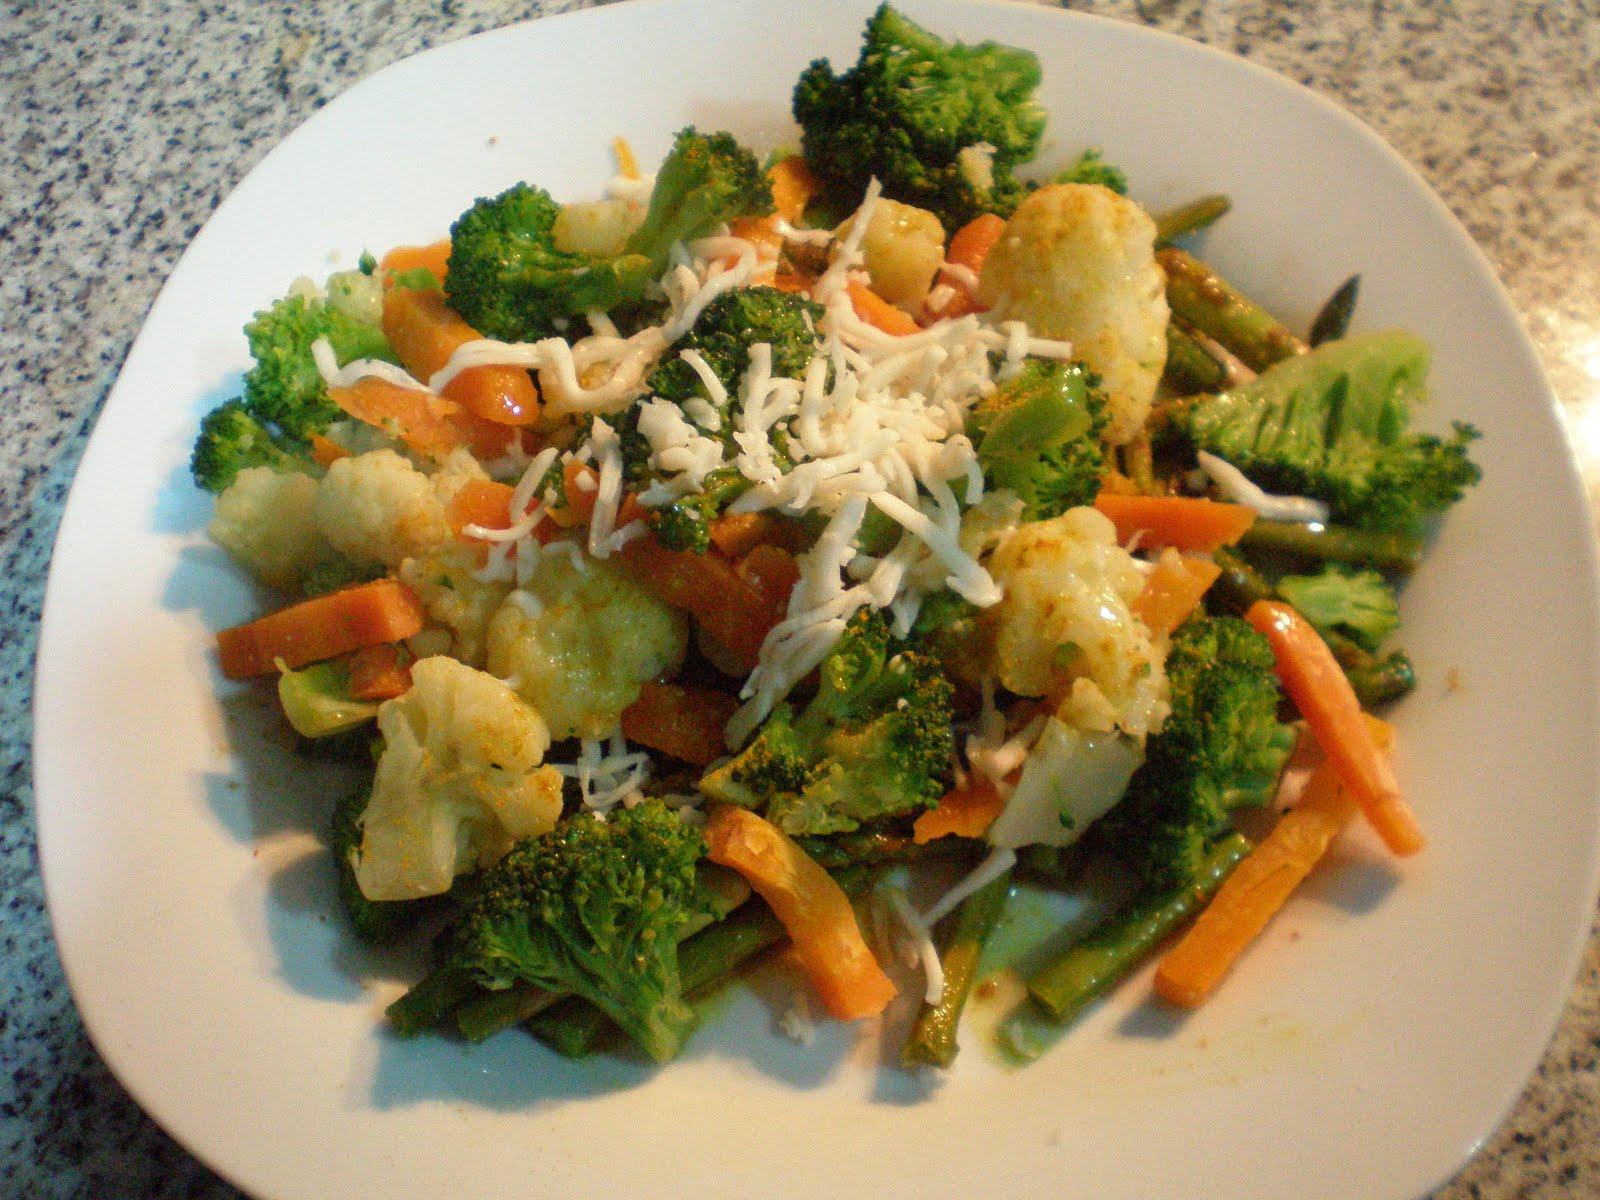 Receta de menestra de verduras con philadelphia - Menestra de verduras en texturas ...